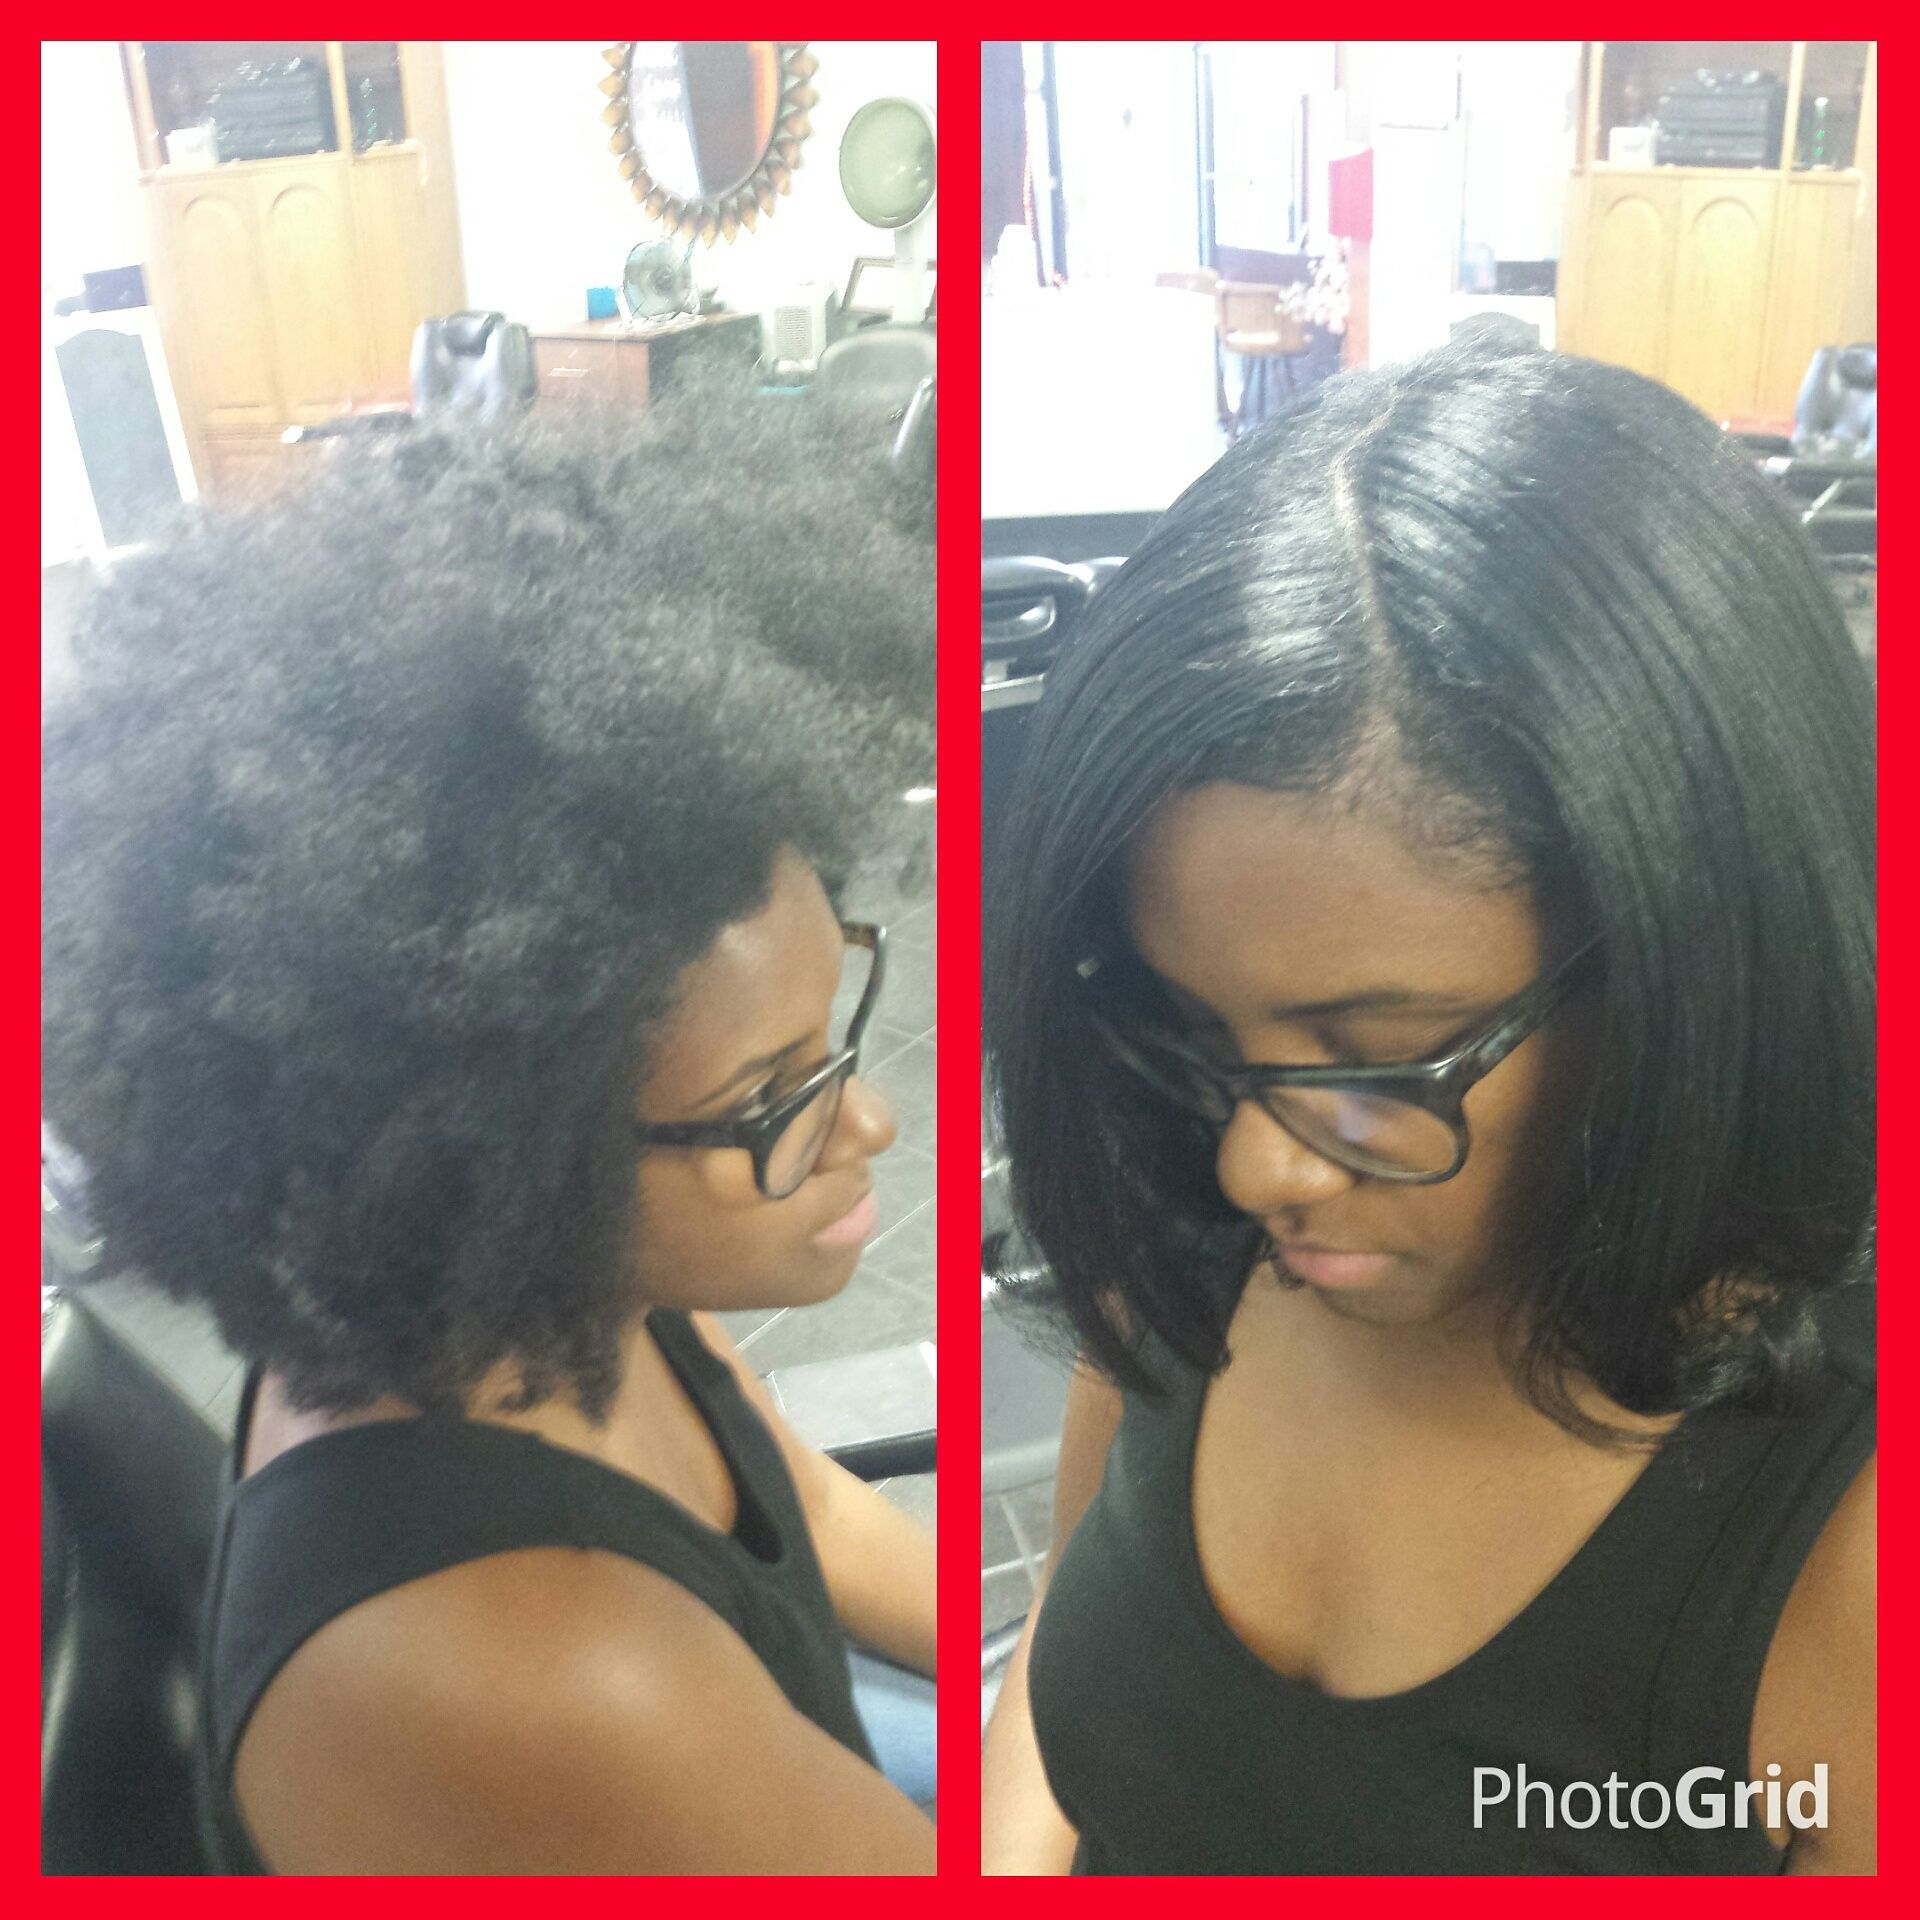 Blowout Silk Press Hair Straightening At Trendz By Tammy Hair Salon Houston Pearland Tx Natural Hair Salons Natural Hair Styles Black Hair Salons